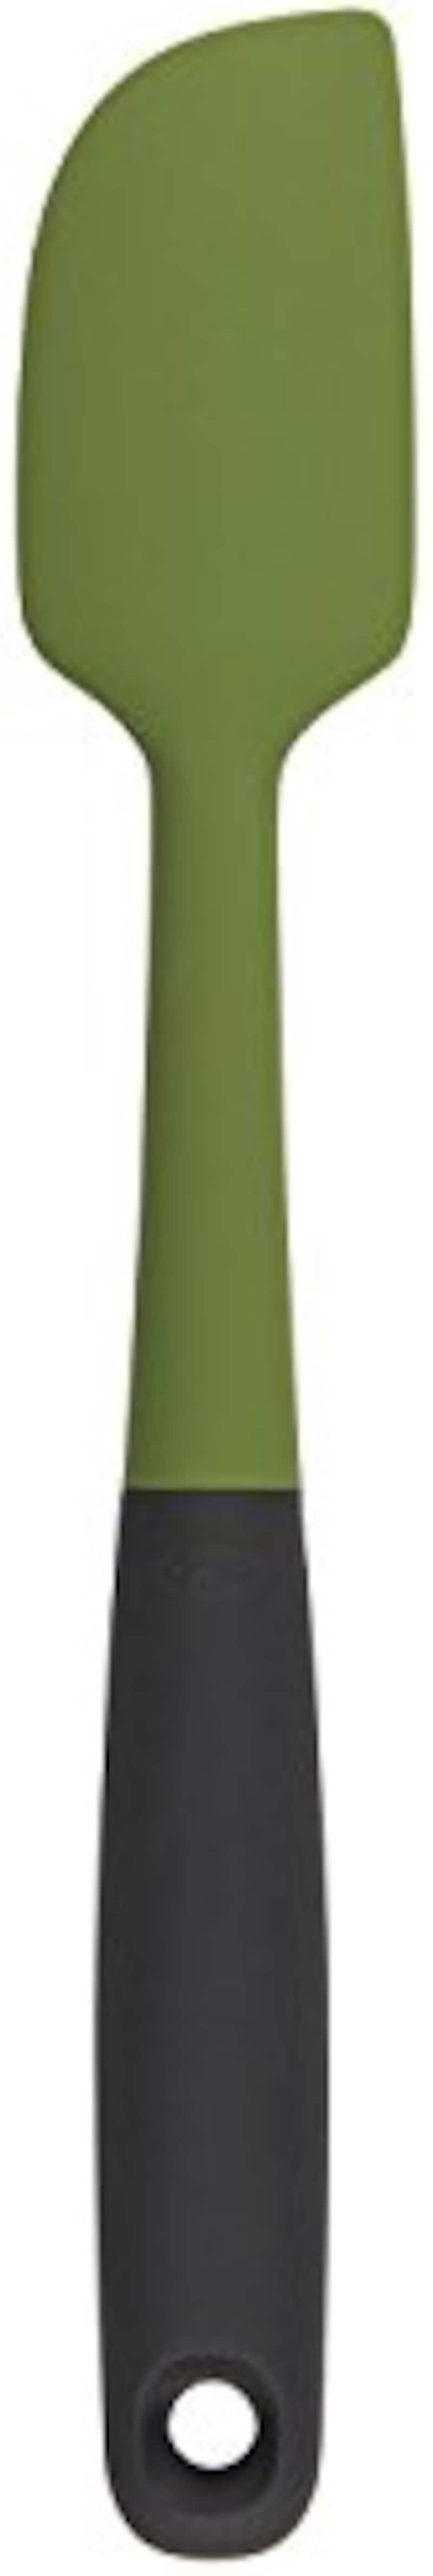 OXO(オクソー),シリコン スパチュラ S,11134605